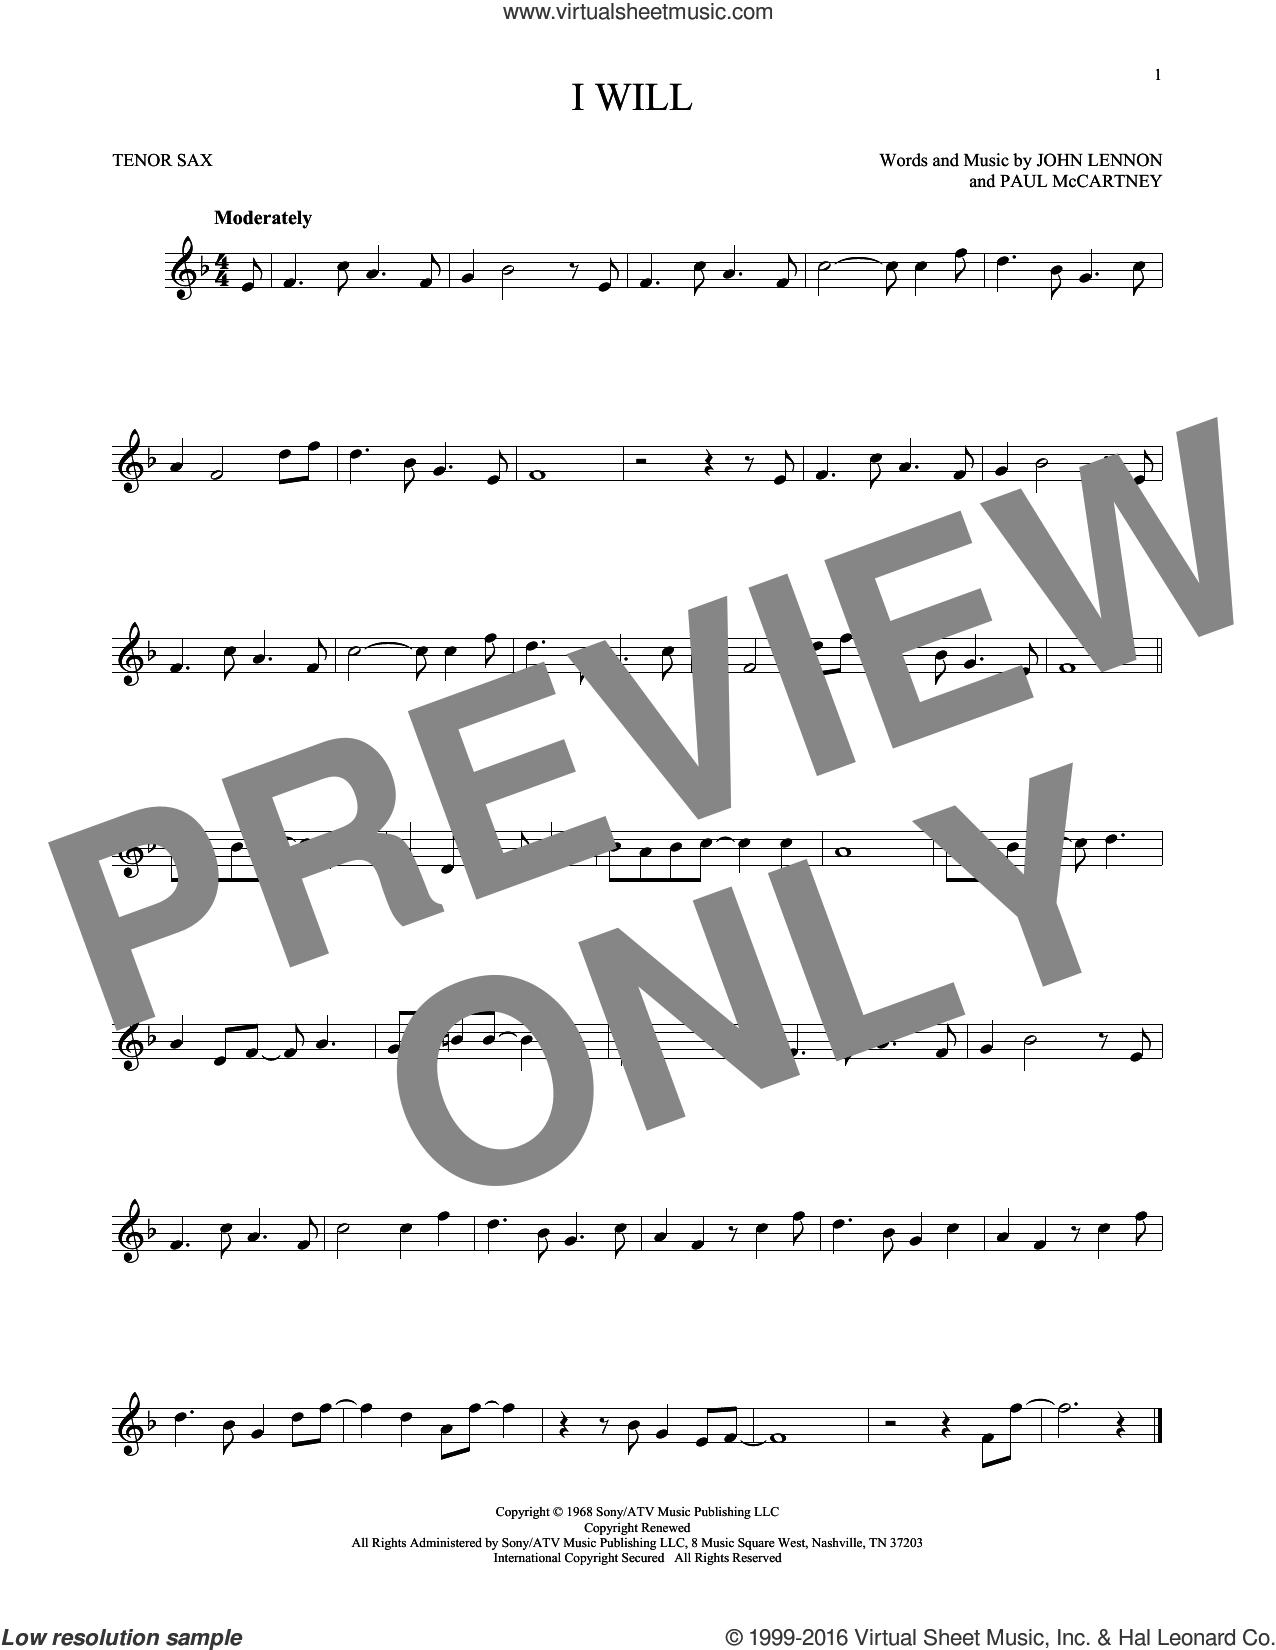 I Will sheet music for tenor saxophone solo by The Beatles, John Lennon and Paul McCartney, intermediate skill level